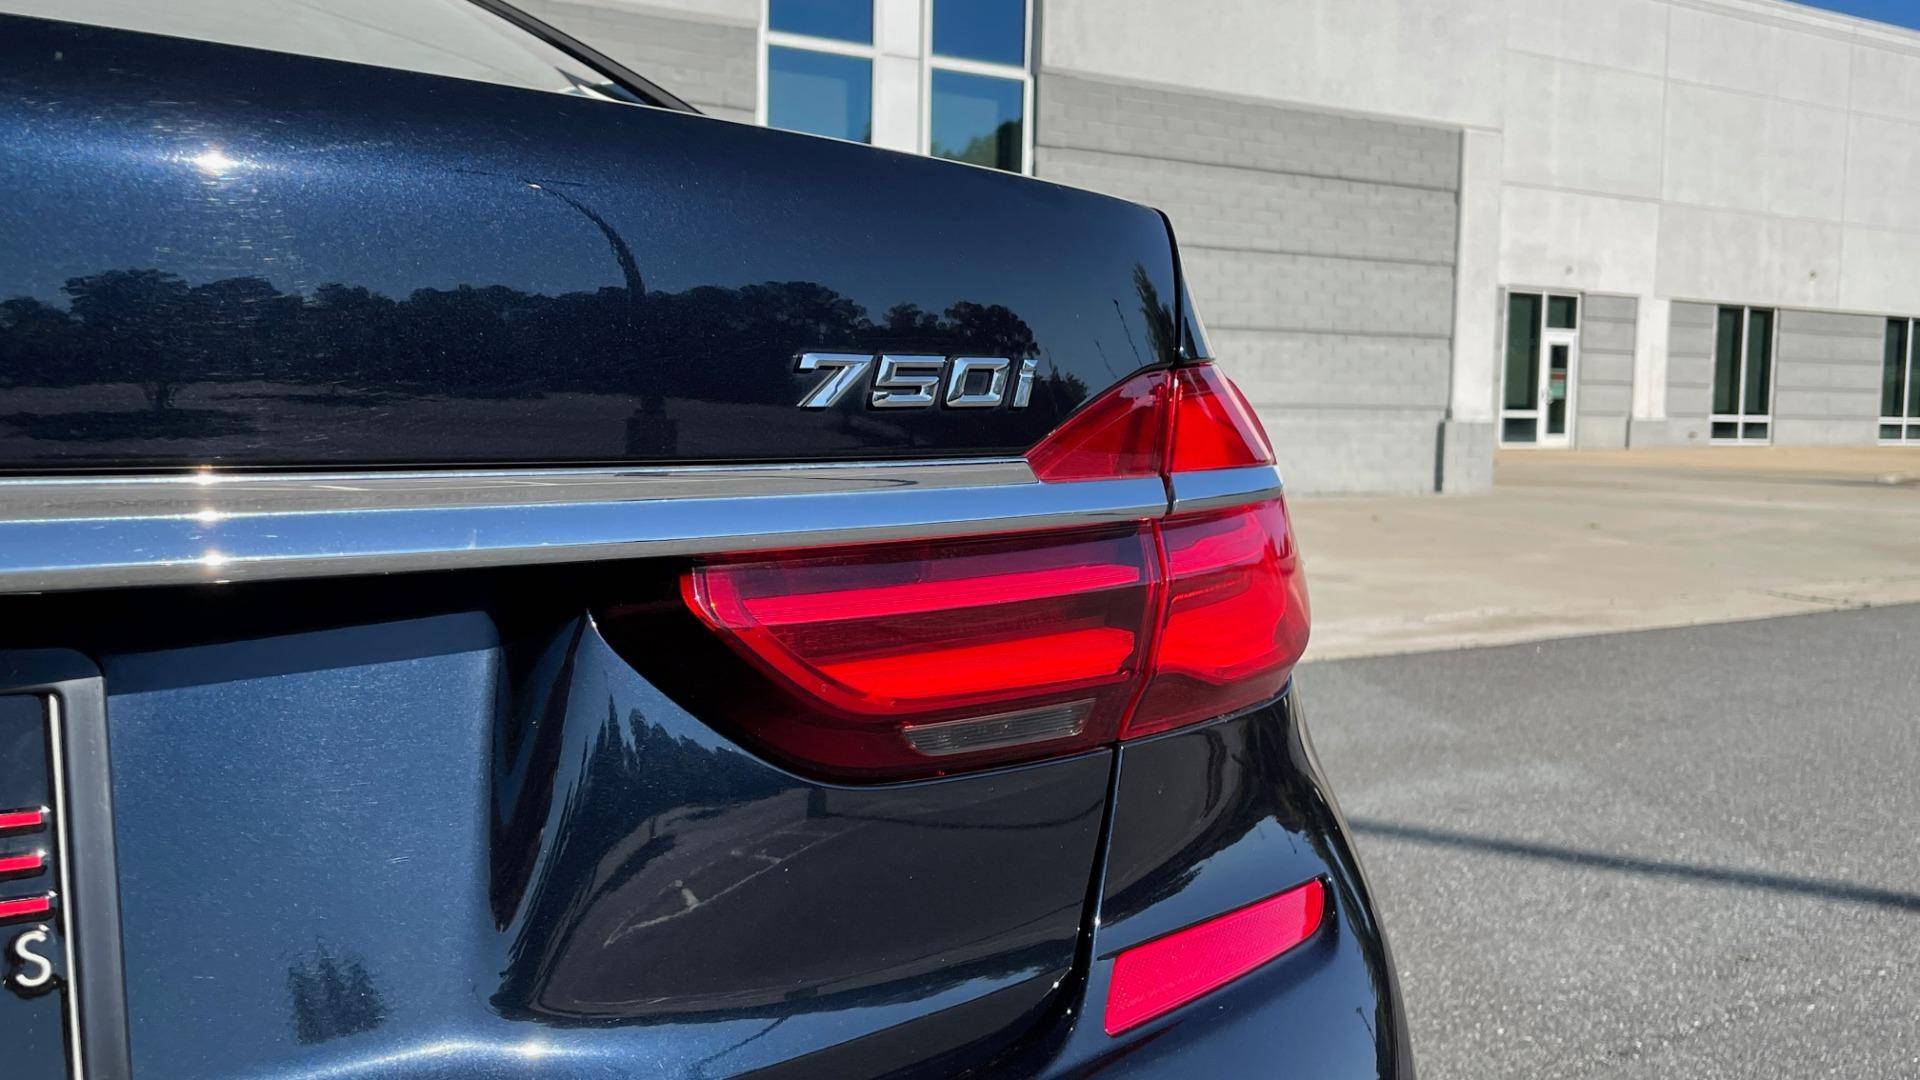 Used 2019 BMW 7 SERIES 750I XDRIVE M-SPORT / EXEC PKG / DRVR ASST PLUS / CLD WTHR / PAR for sale $60,995 at Formula Imports in Charlotte NC 28227 18